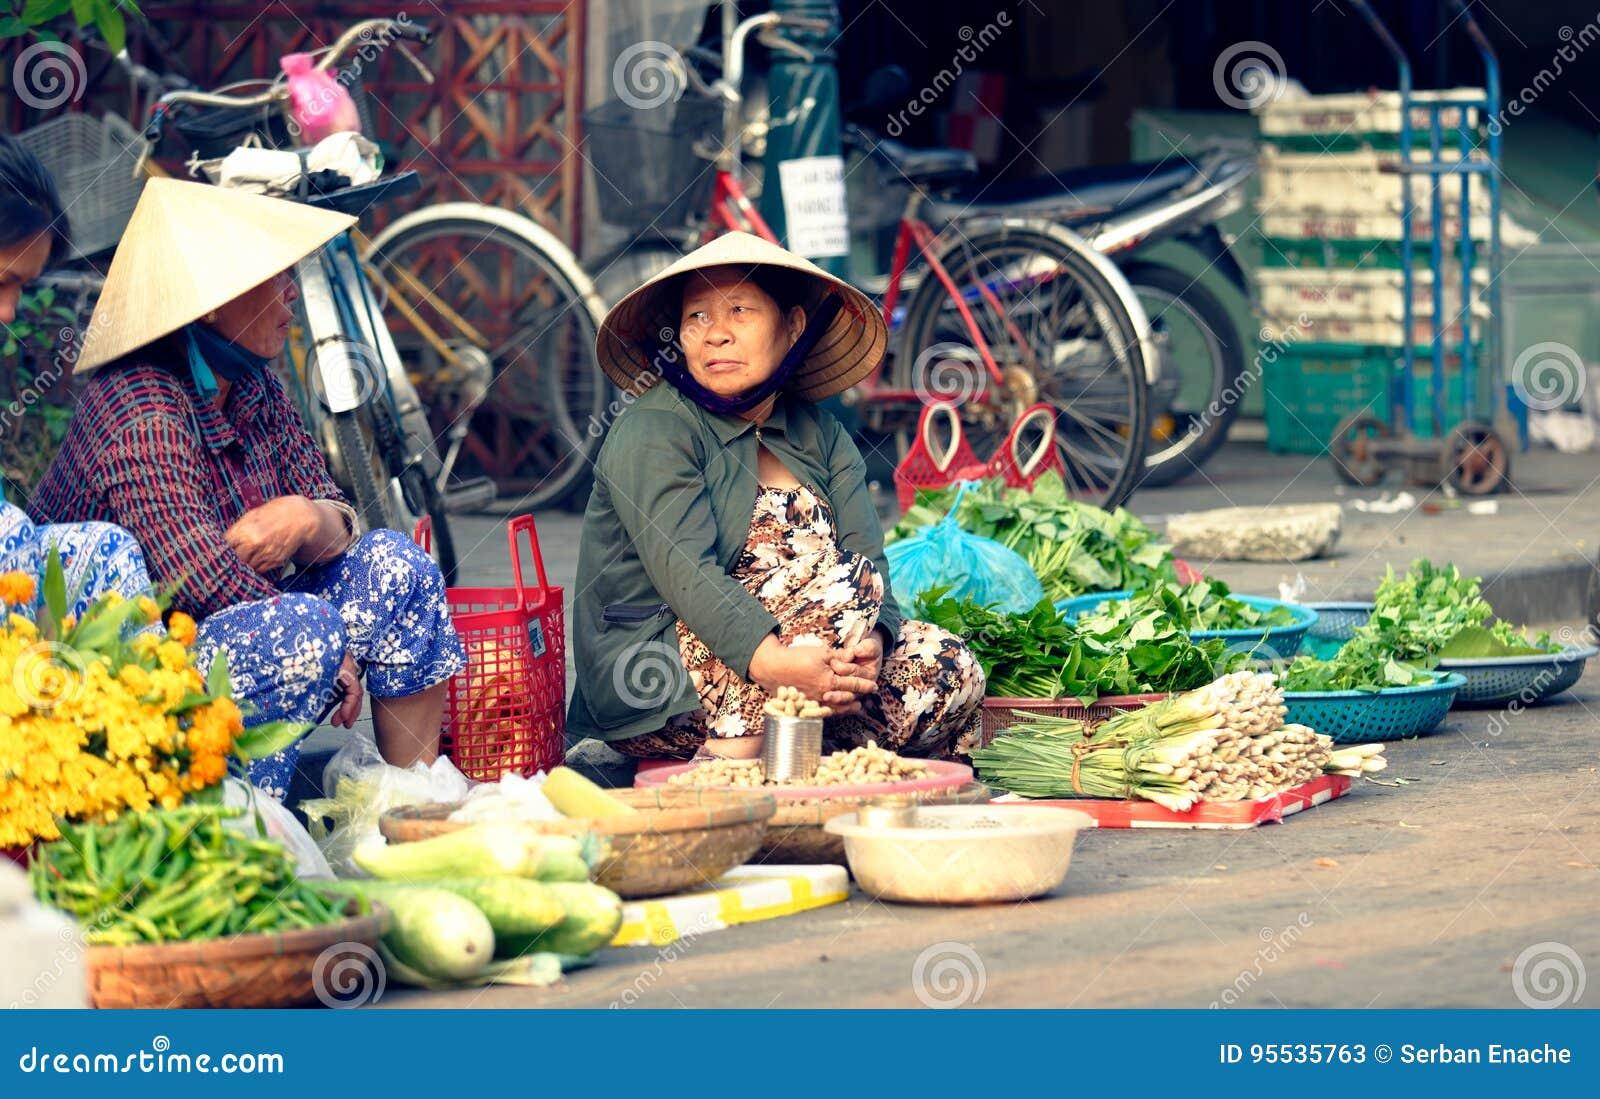 8cde2c055e4 Vietnamese Women Selling Vegetables On Street Editorial Stock Photo ...